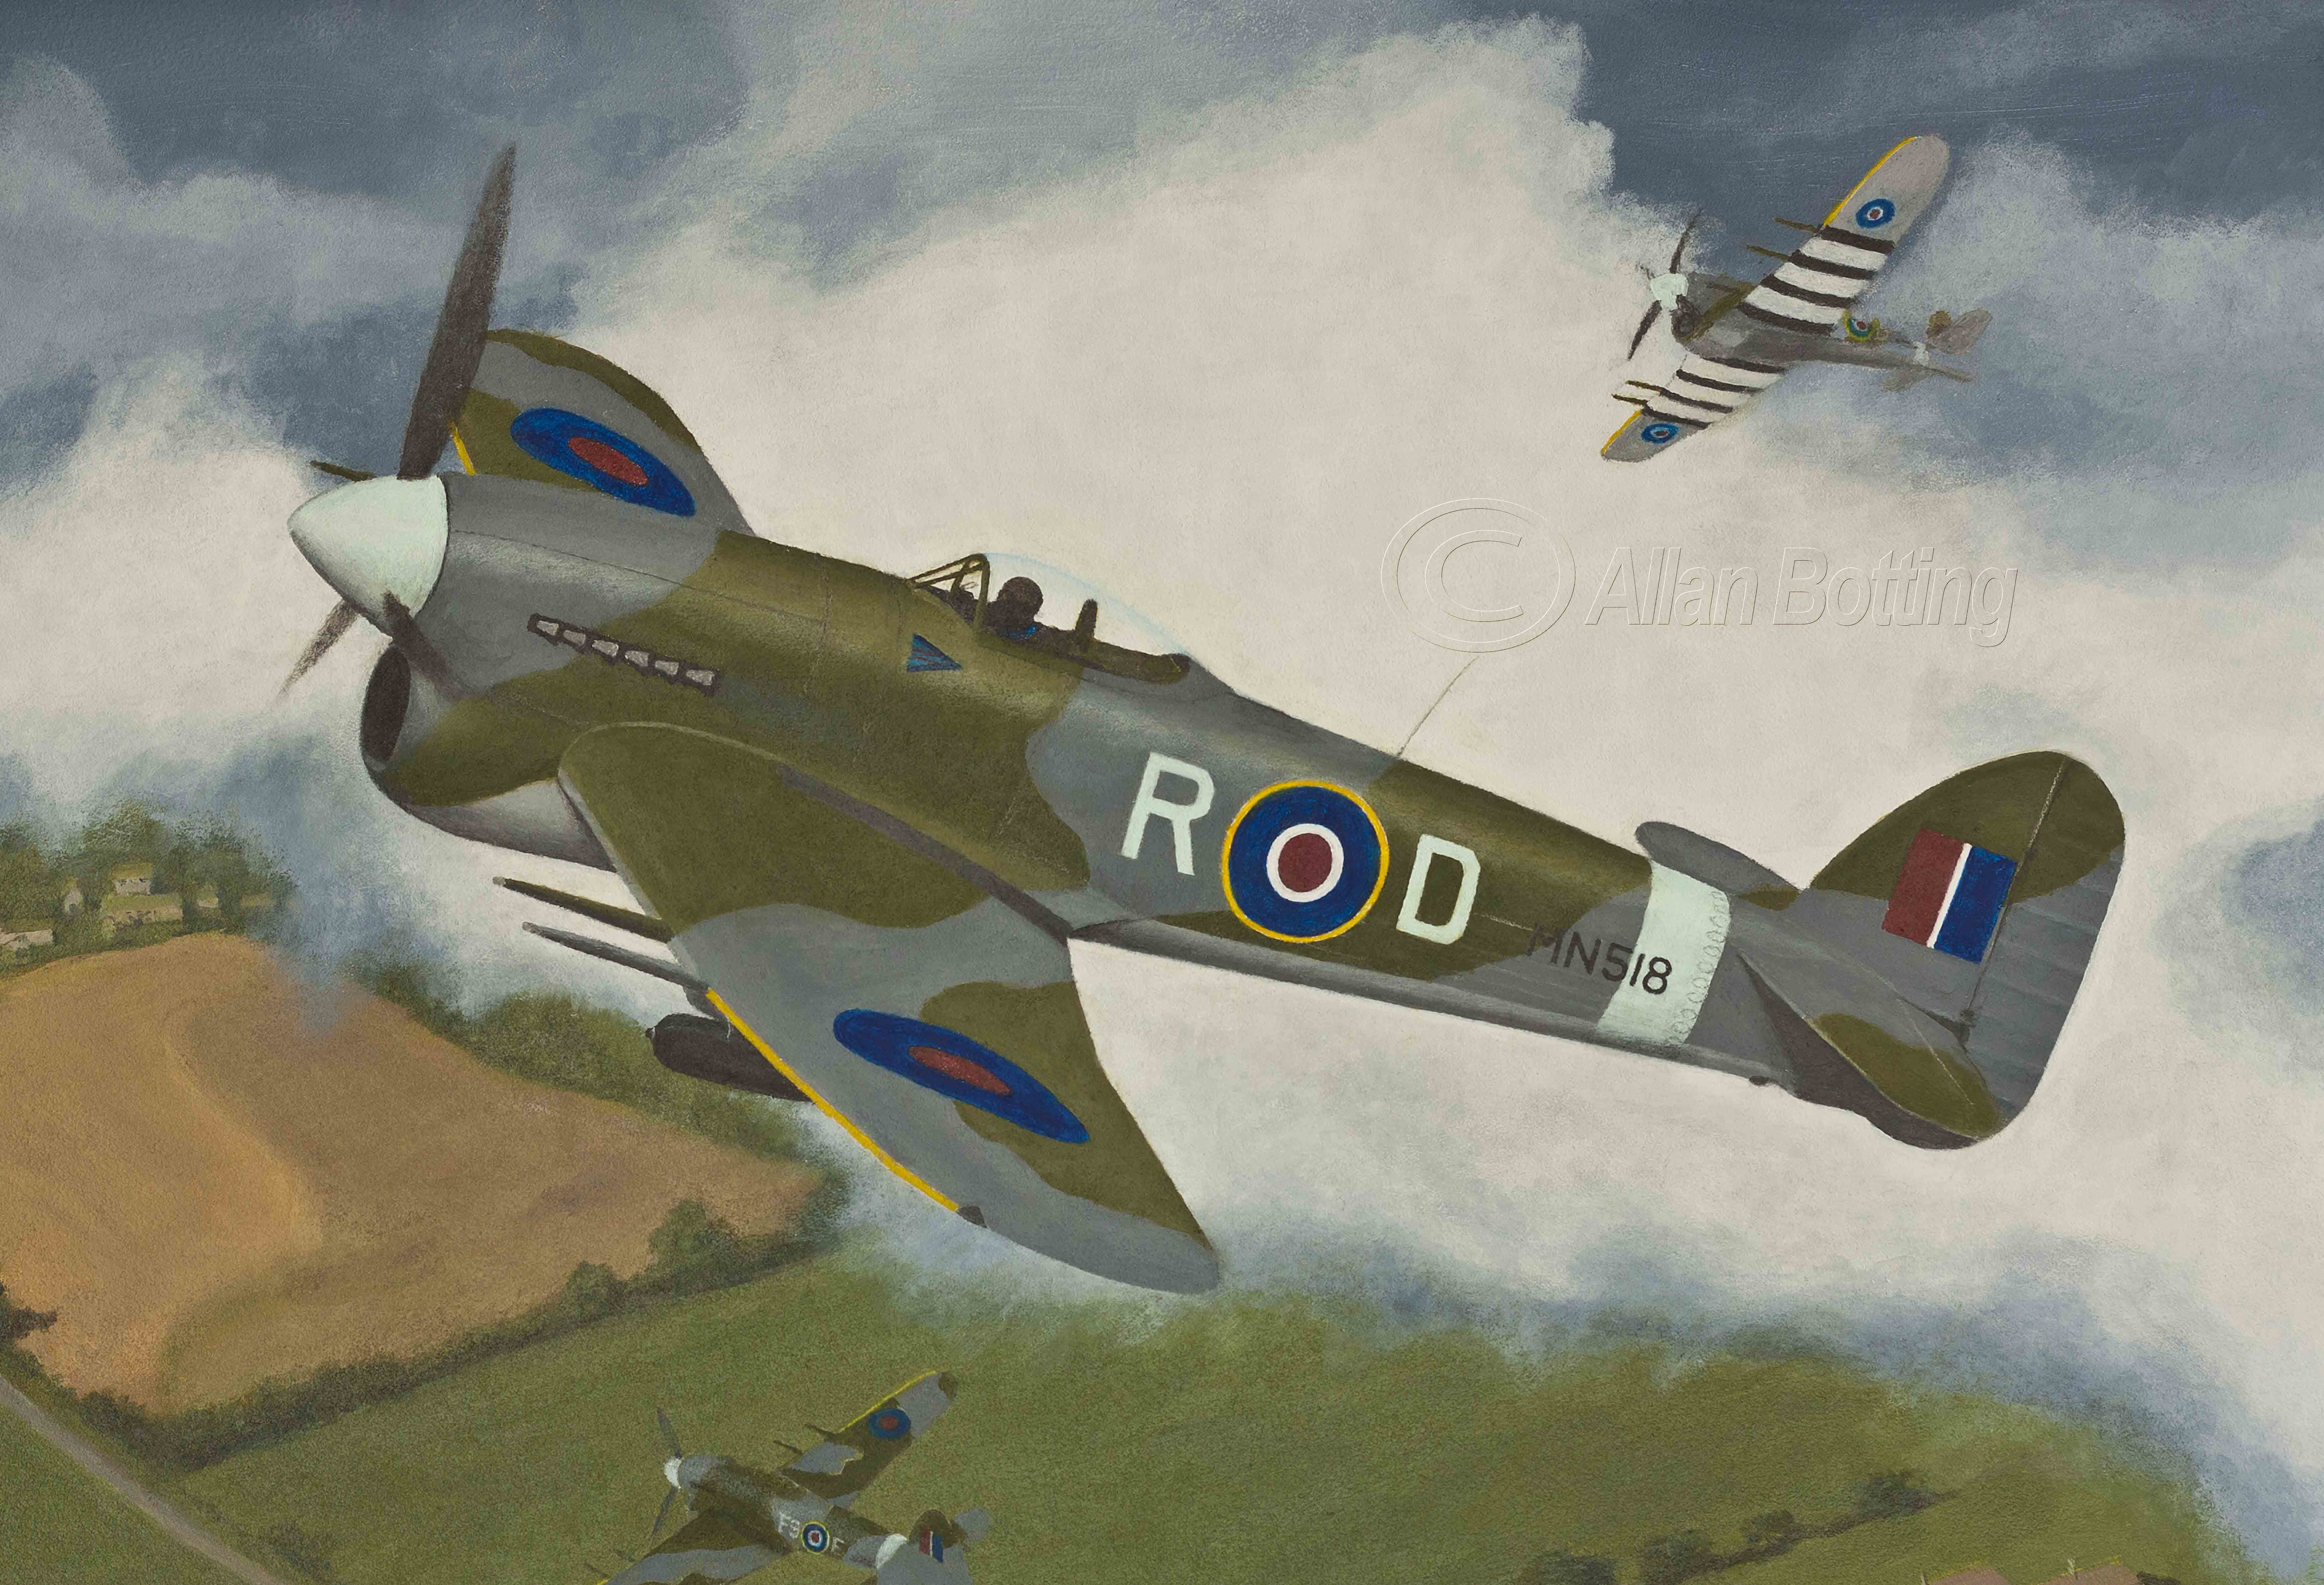 Botting Allan. Истребитель Hawker Typhoon Mk.1B.